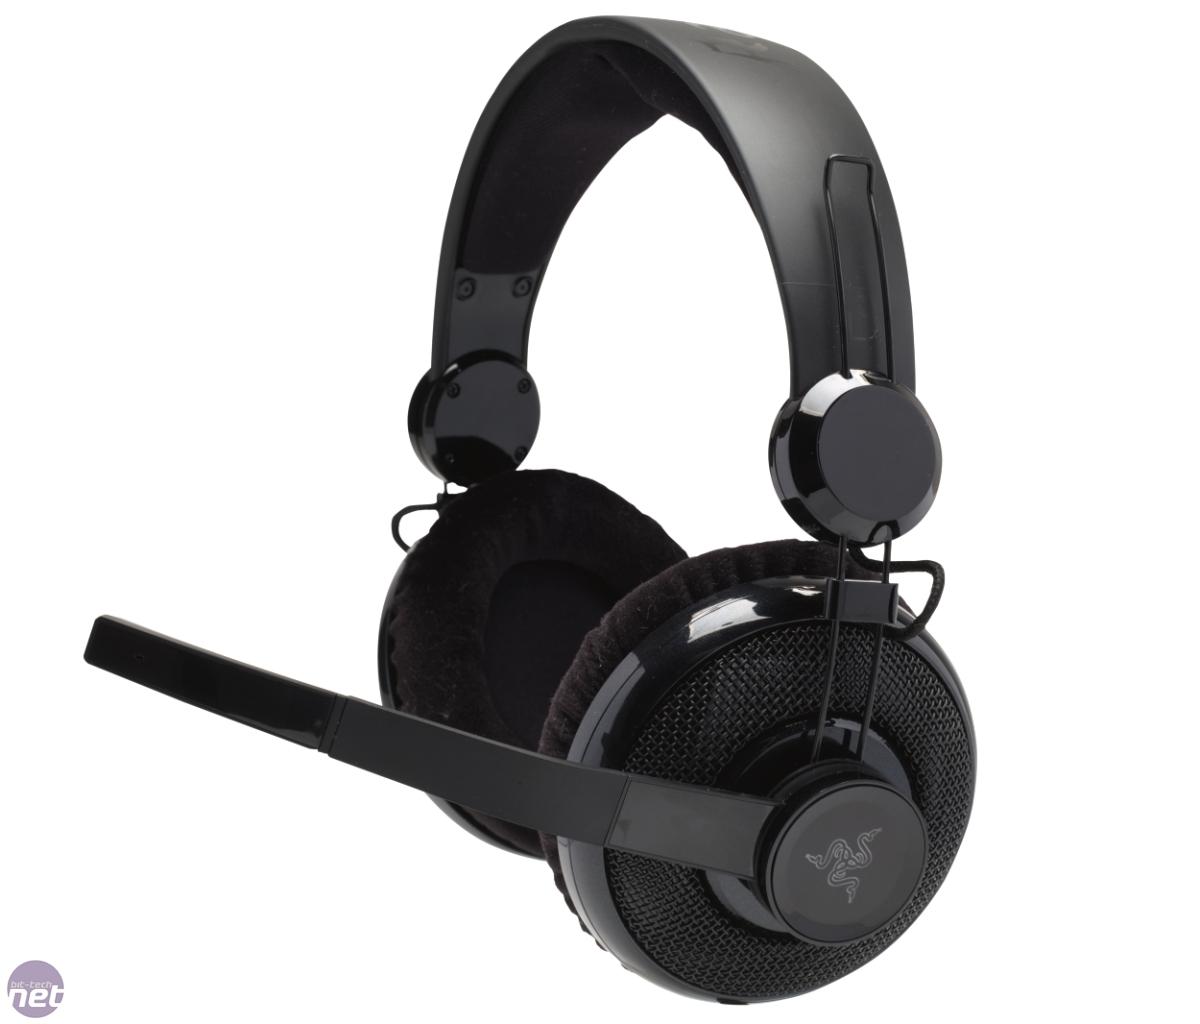 headphone cord diagram  headphone  free engine image for